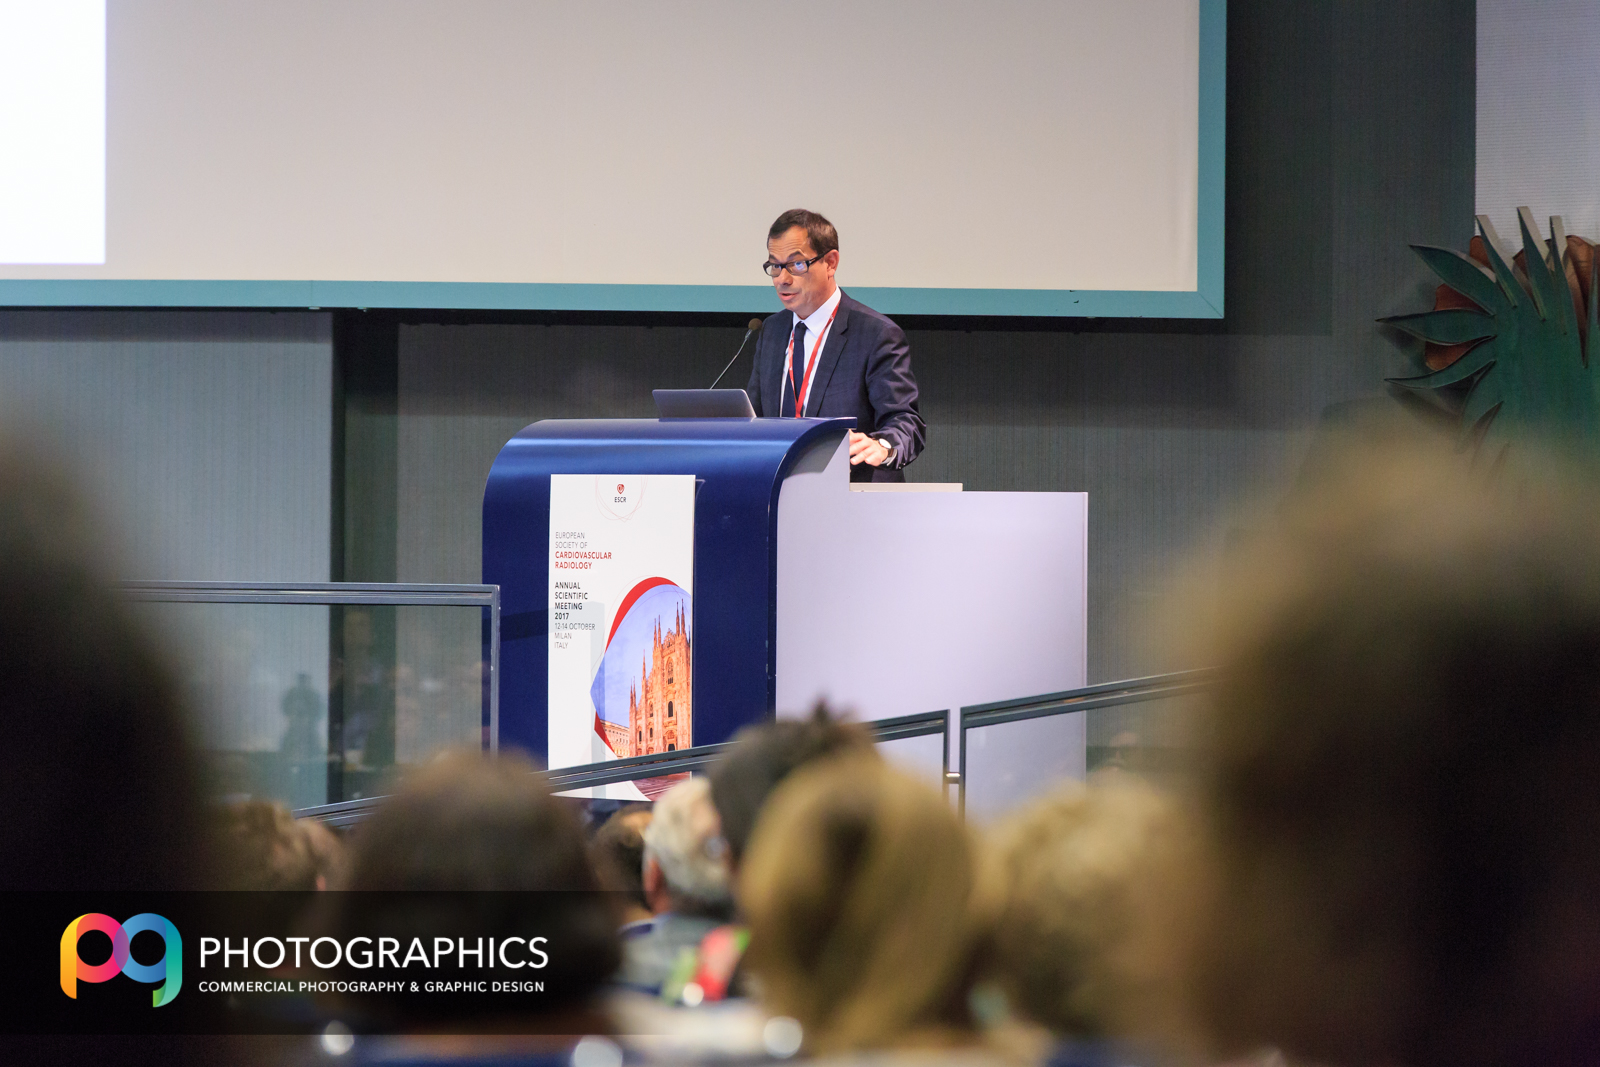 ESCR-2018-conference-event-photography-UK-glasgow-edinburgh-21.jpg